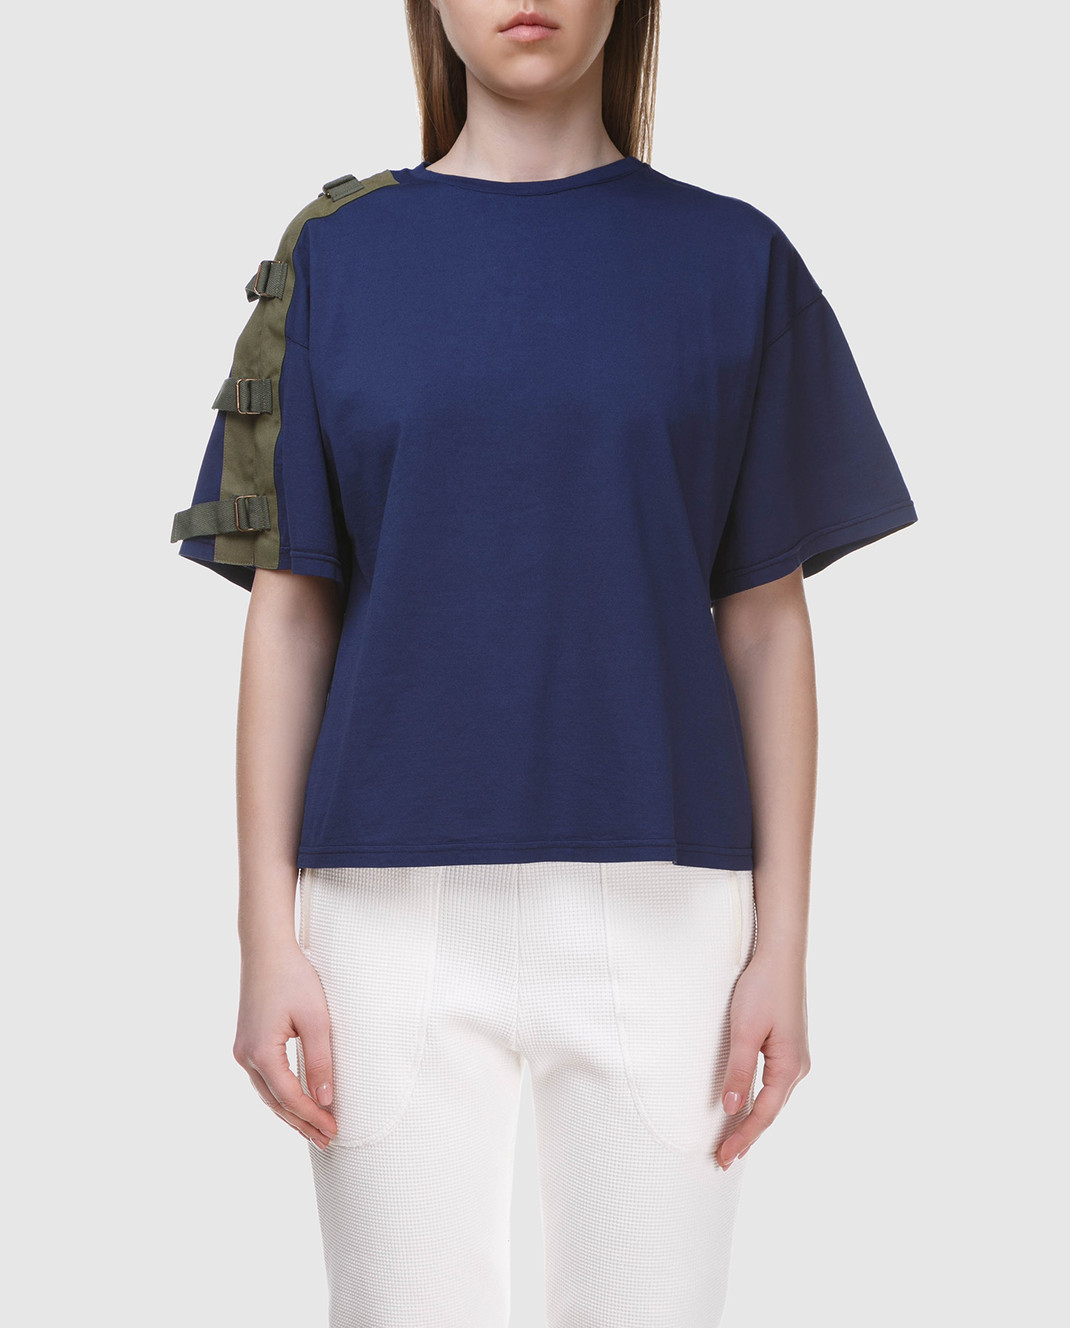 Mr&Mrs Italy Темно-синяя футболка с вышивкой на спине изображение 3